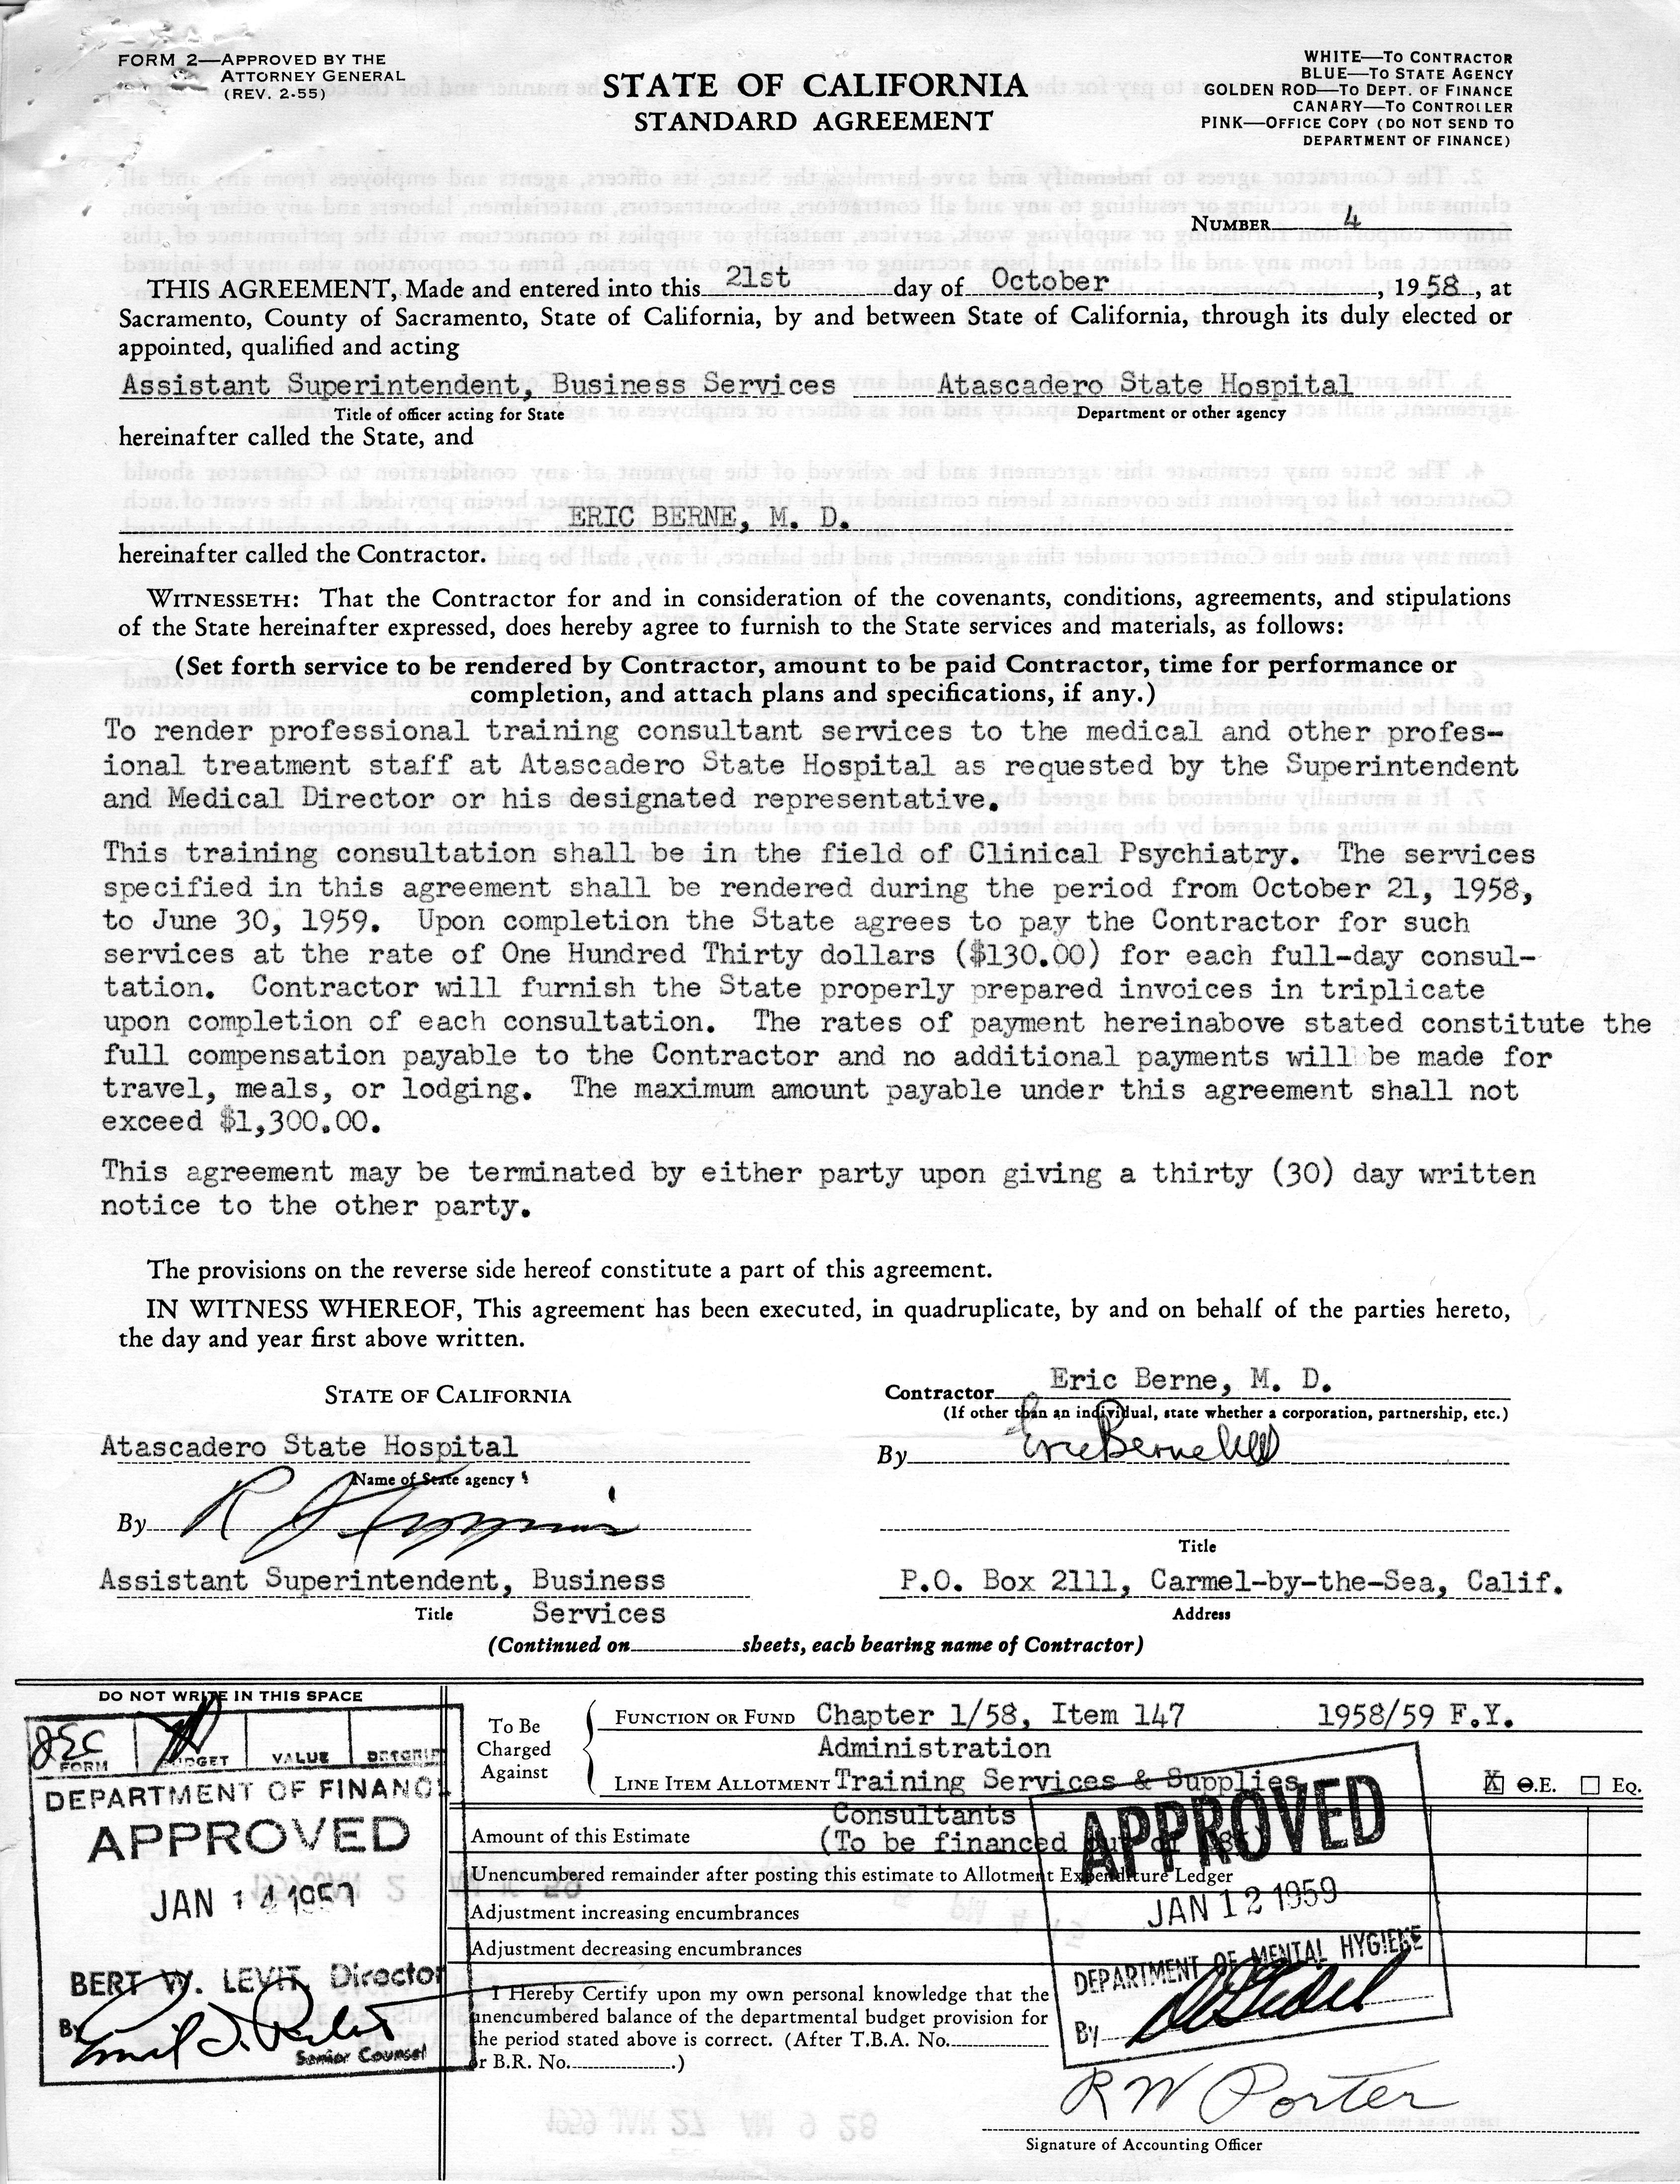 Calisphere state of california standard agreement between state of california standard agreement between atascadero state hospital and eric berne platinumwayz